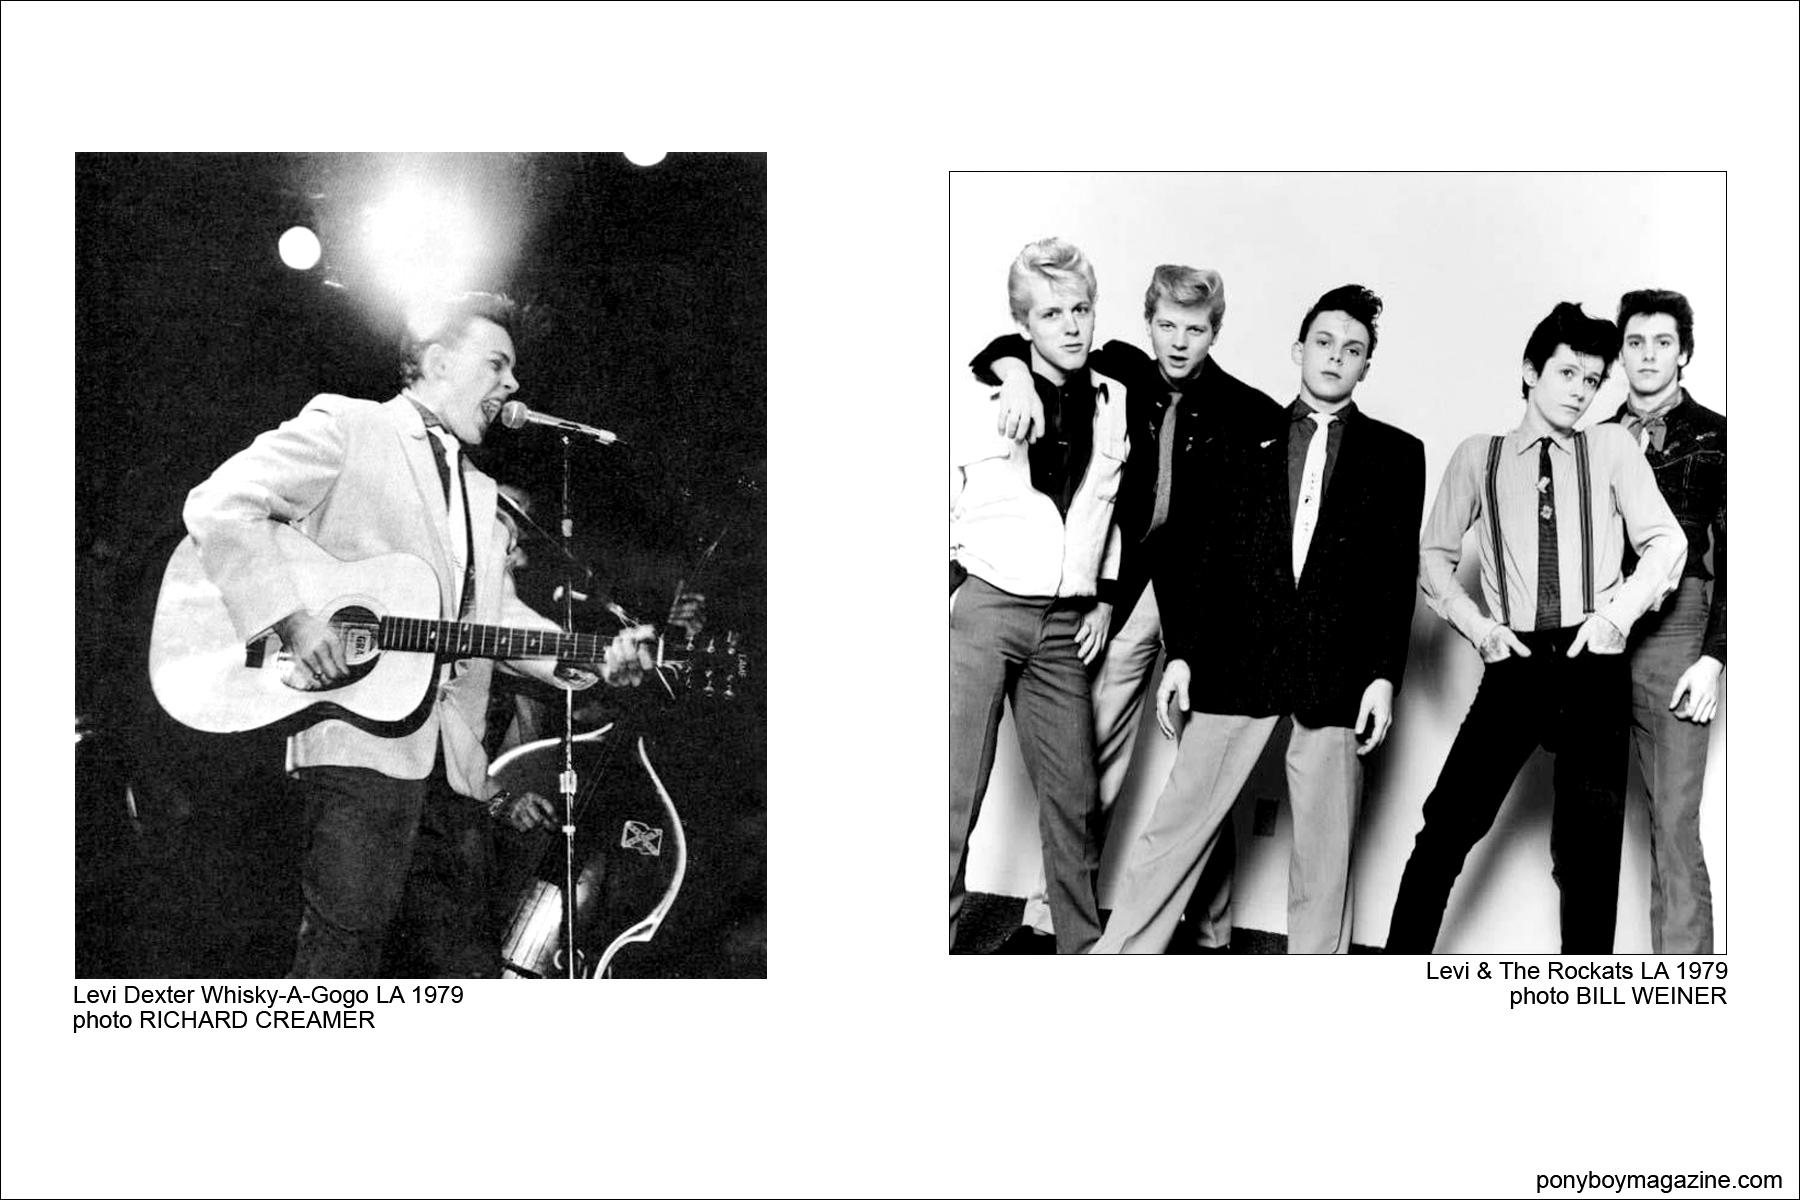 Old b&w photos of Rockabilly band Levi & The Rockats for Ponyboy Magazine.